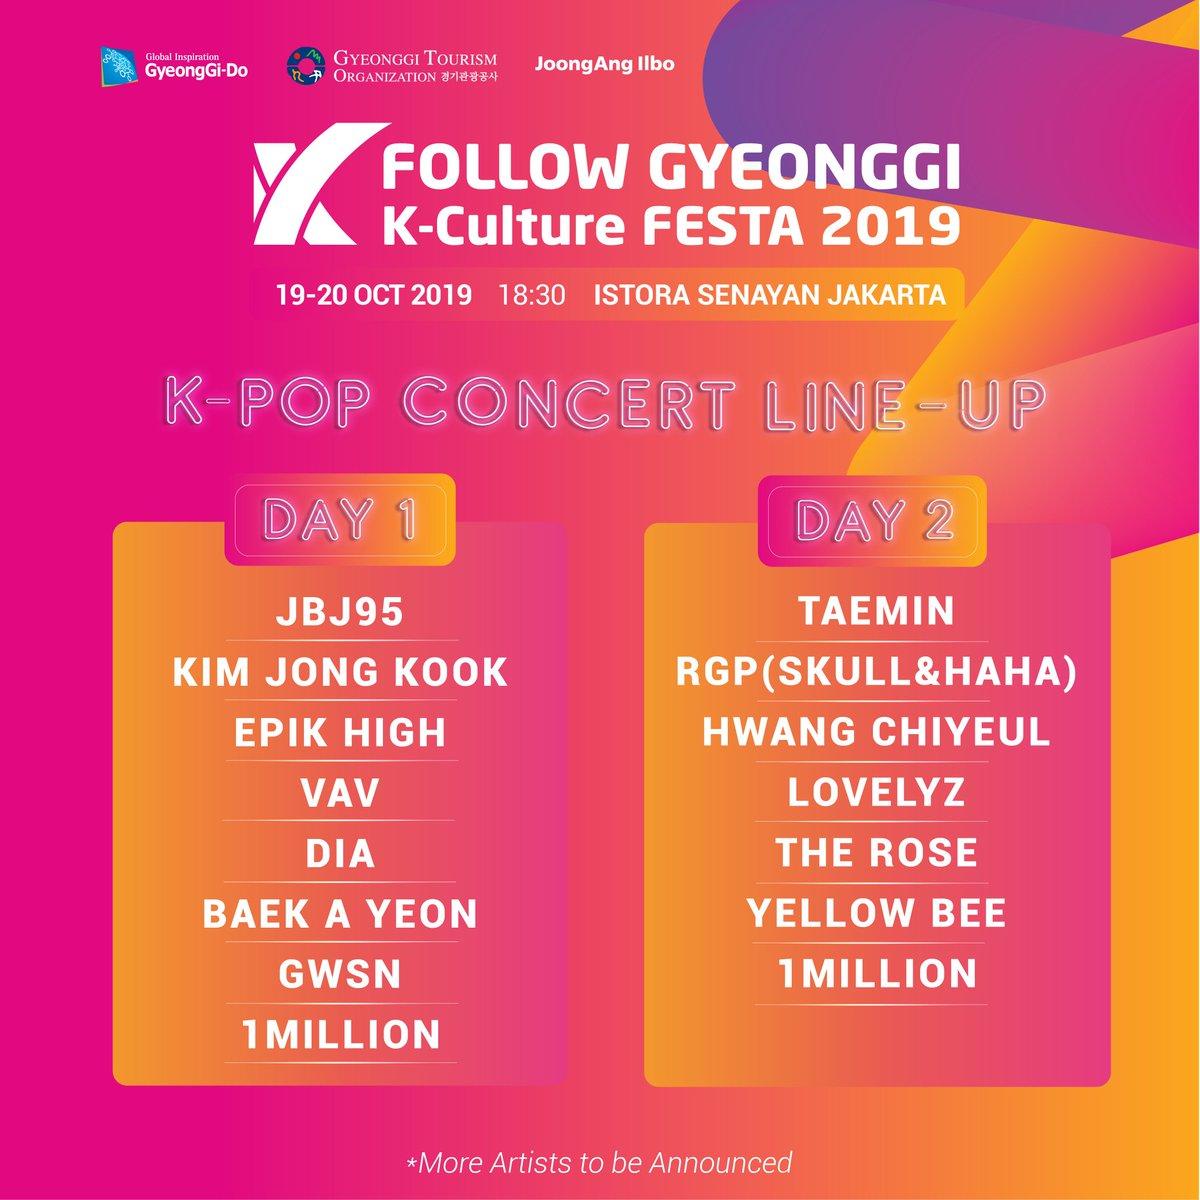 [CONFIRMED] TAEMIN to attend Follow Gyeonggi K-Culture Festa 2019 in Istora Senayan, Jakarta on October 20th.  Ticketing start on September 20th. Follow @/follow.gyeonggi Instagram for more info.   #SHINee #샤이니 #TAEMIN #태민 #テミン<br>http://pic.twitter.com/SXRaQFMvZ9